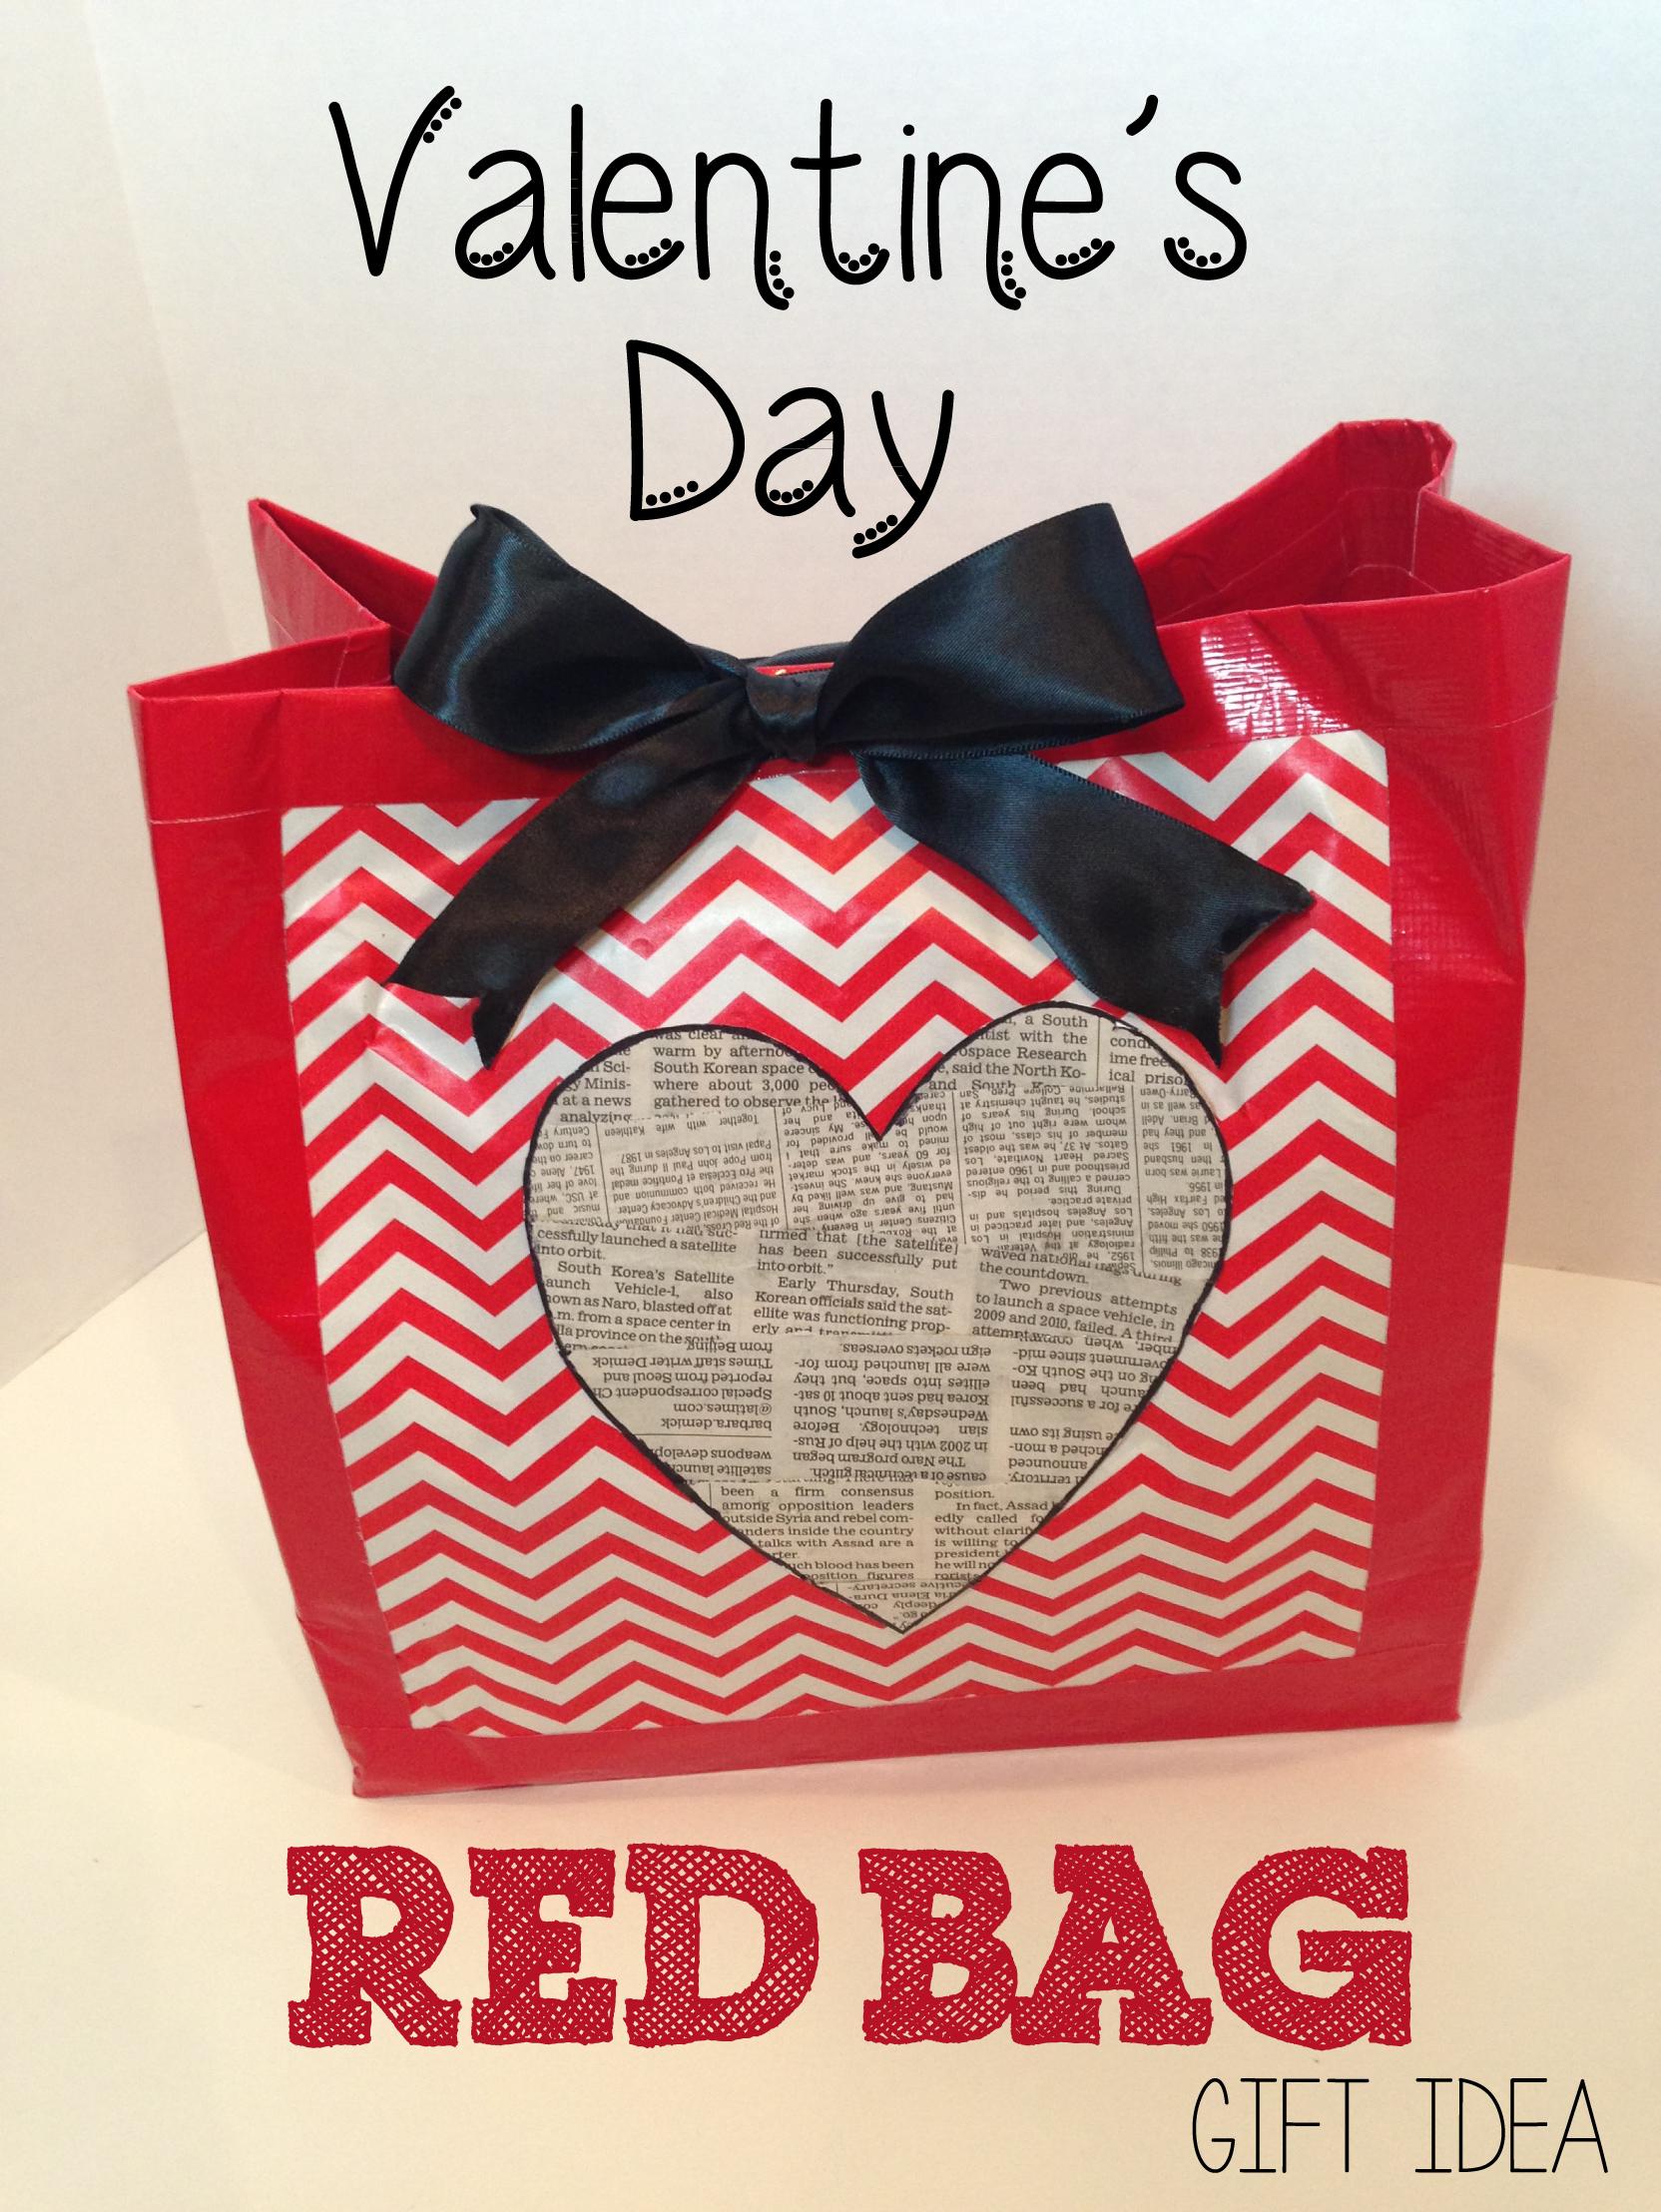 Valentine S Day Red Bag Gift Idea